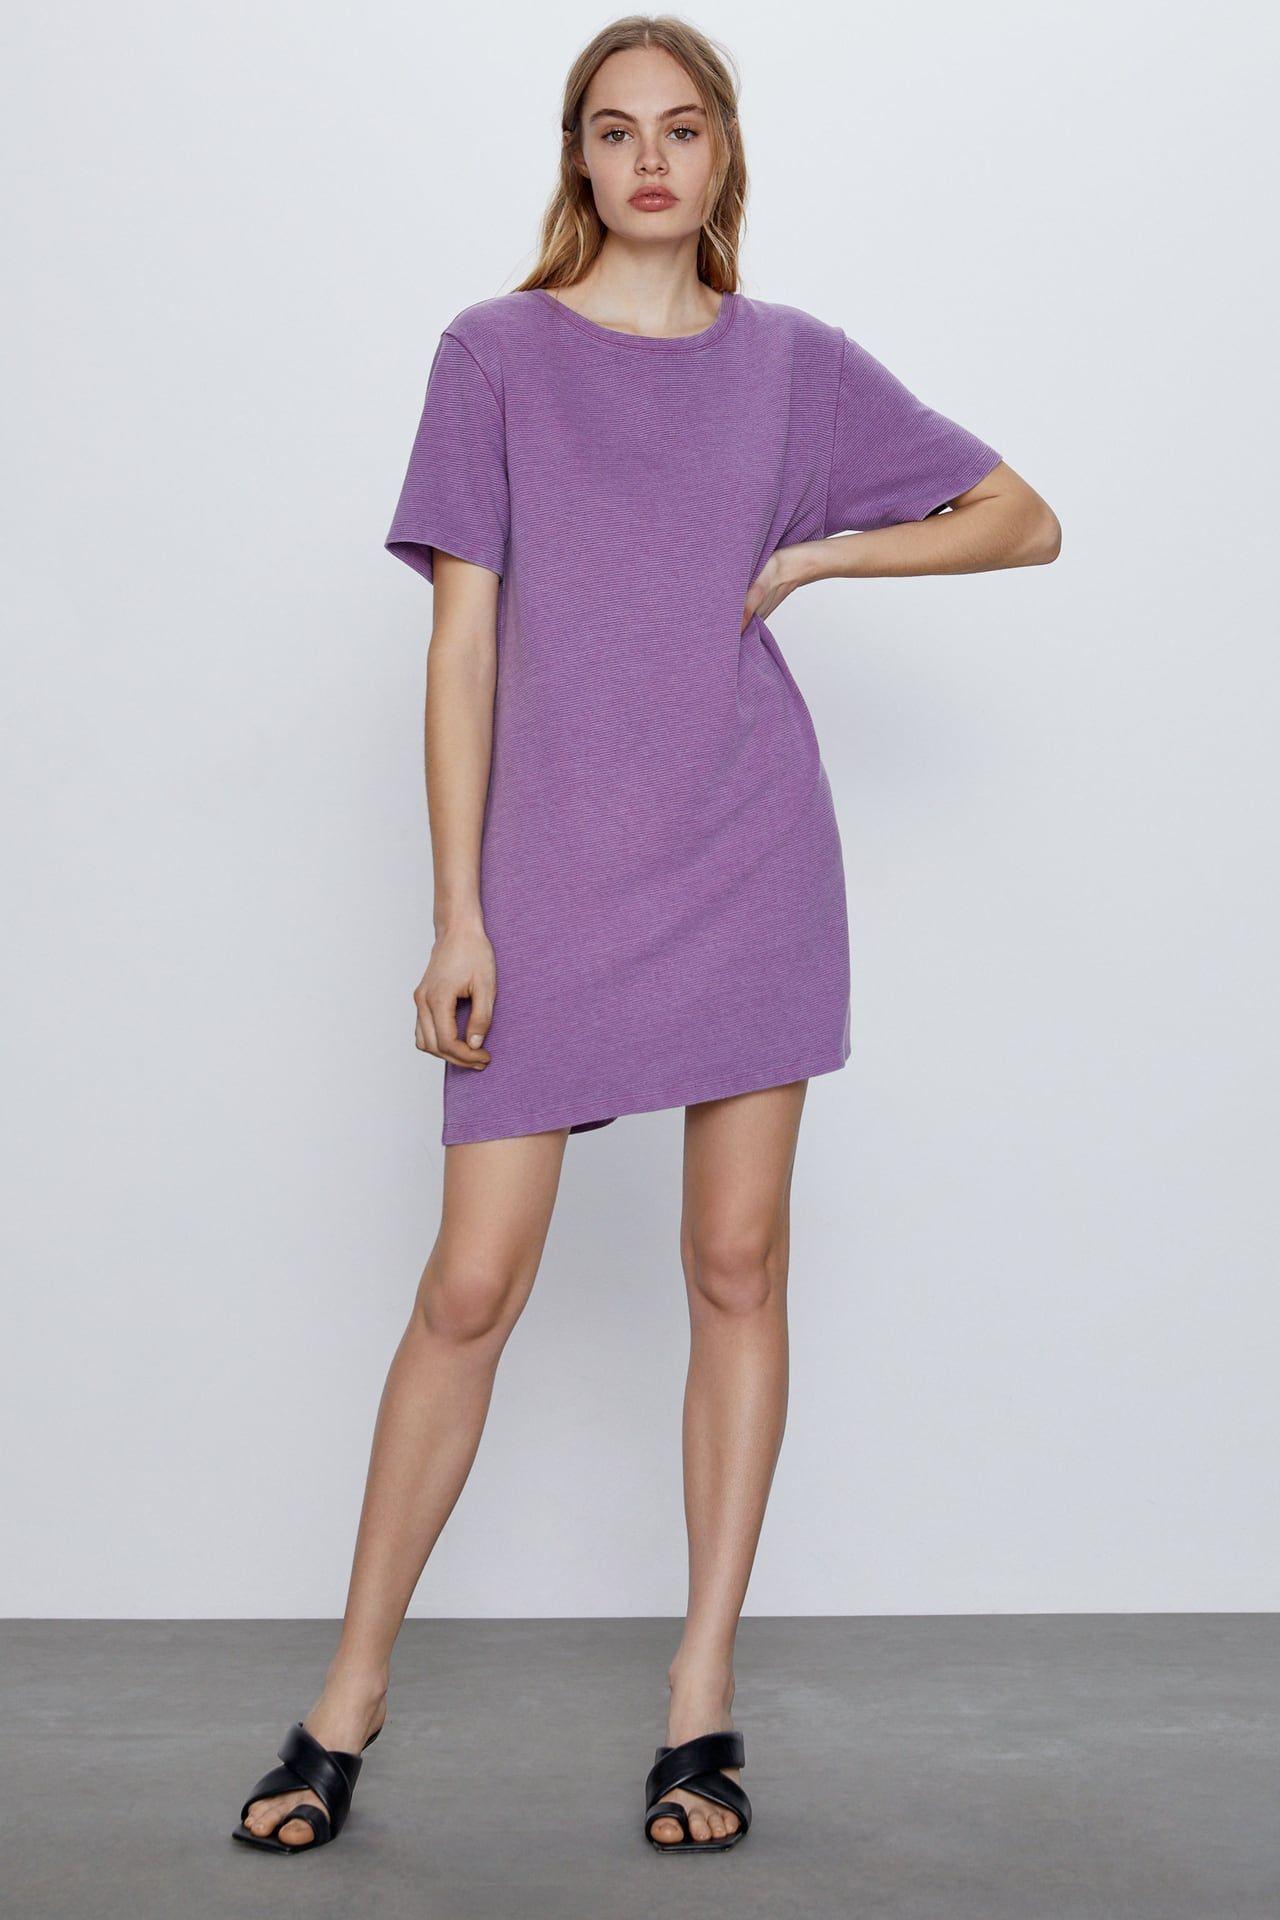 Robe Structurée  Zara France In 2020  Kurze Damenkleider